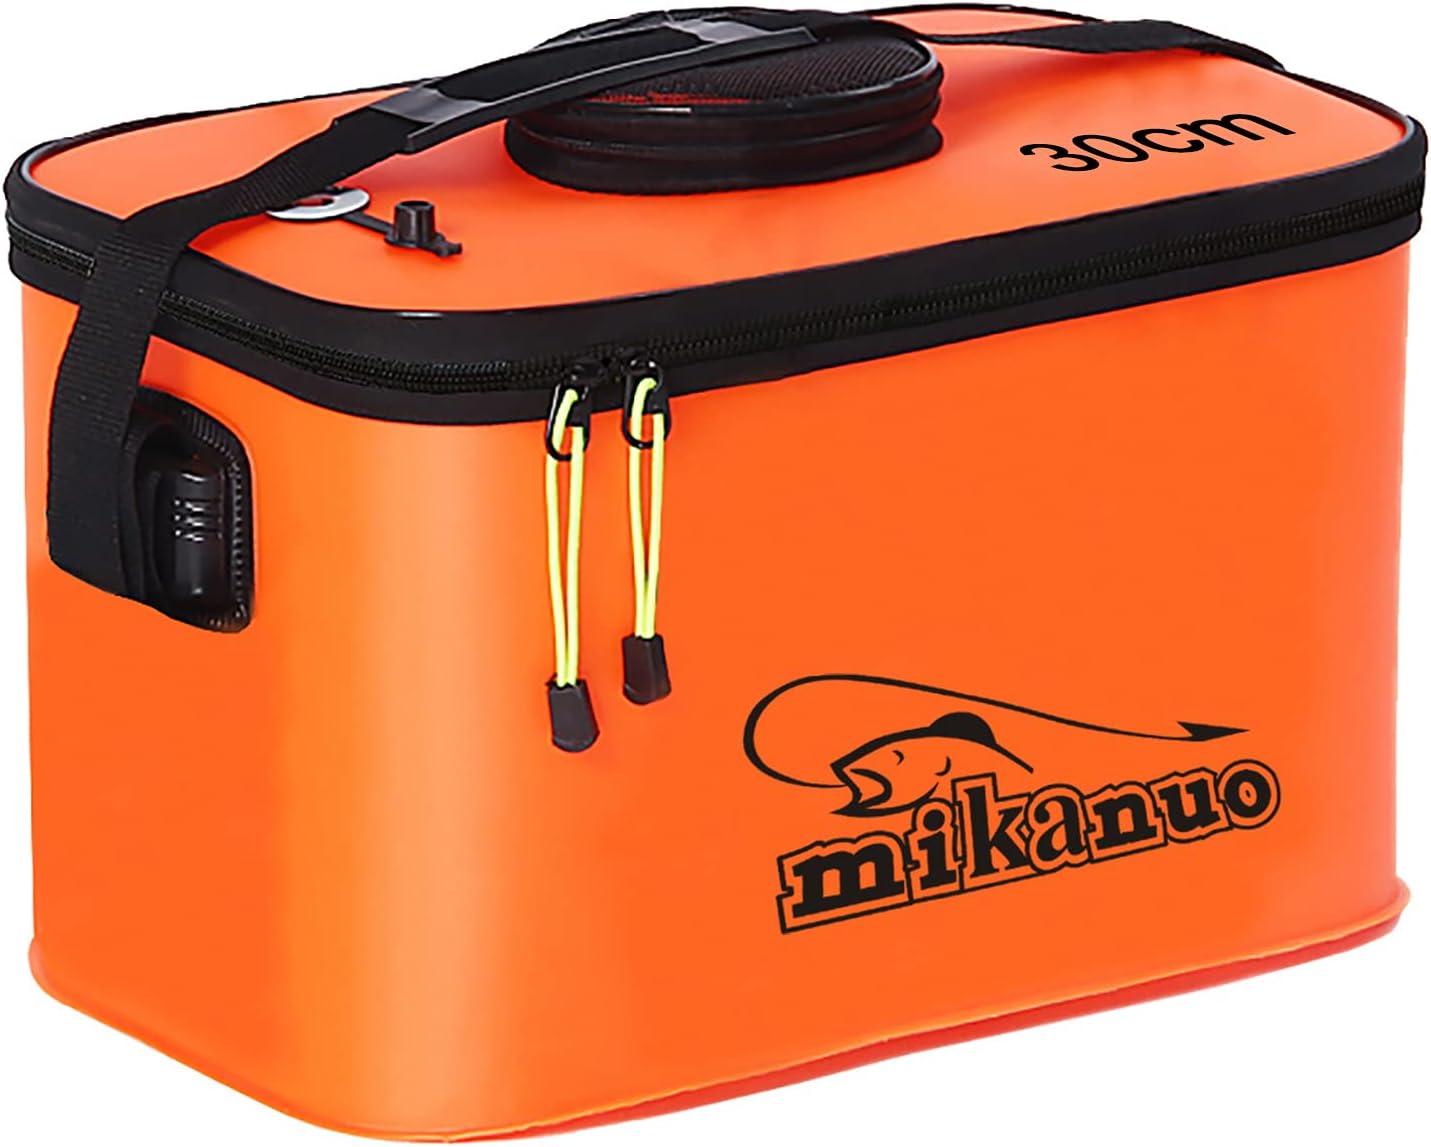 Fishing Bucket Foldable Fish EVA Multi-Functional Fishin Max 74% OFF Courier shipping free